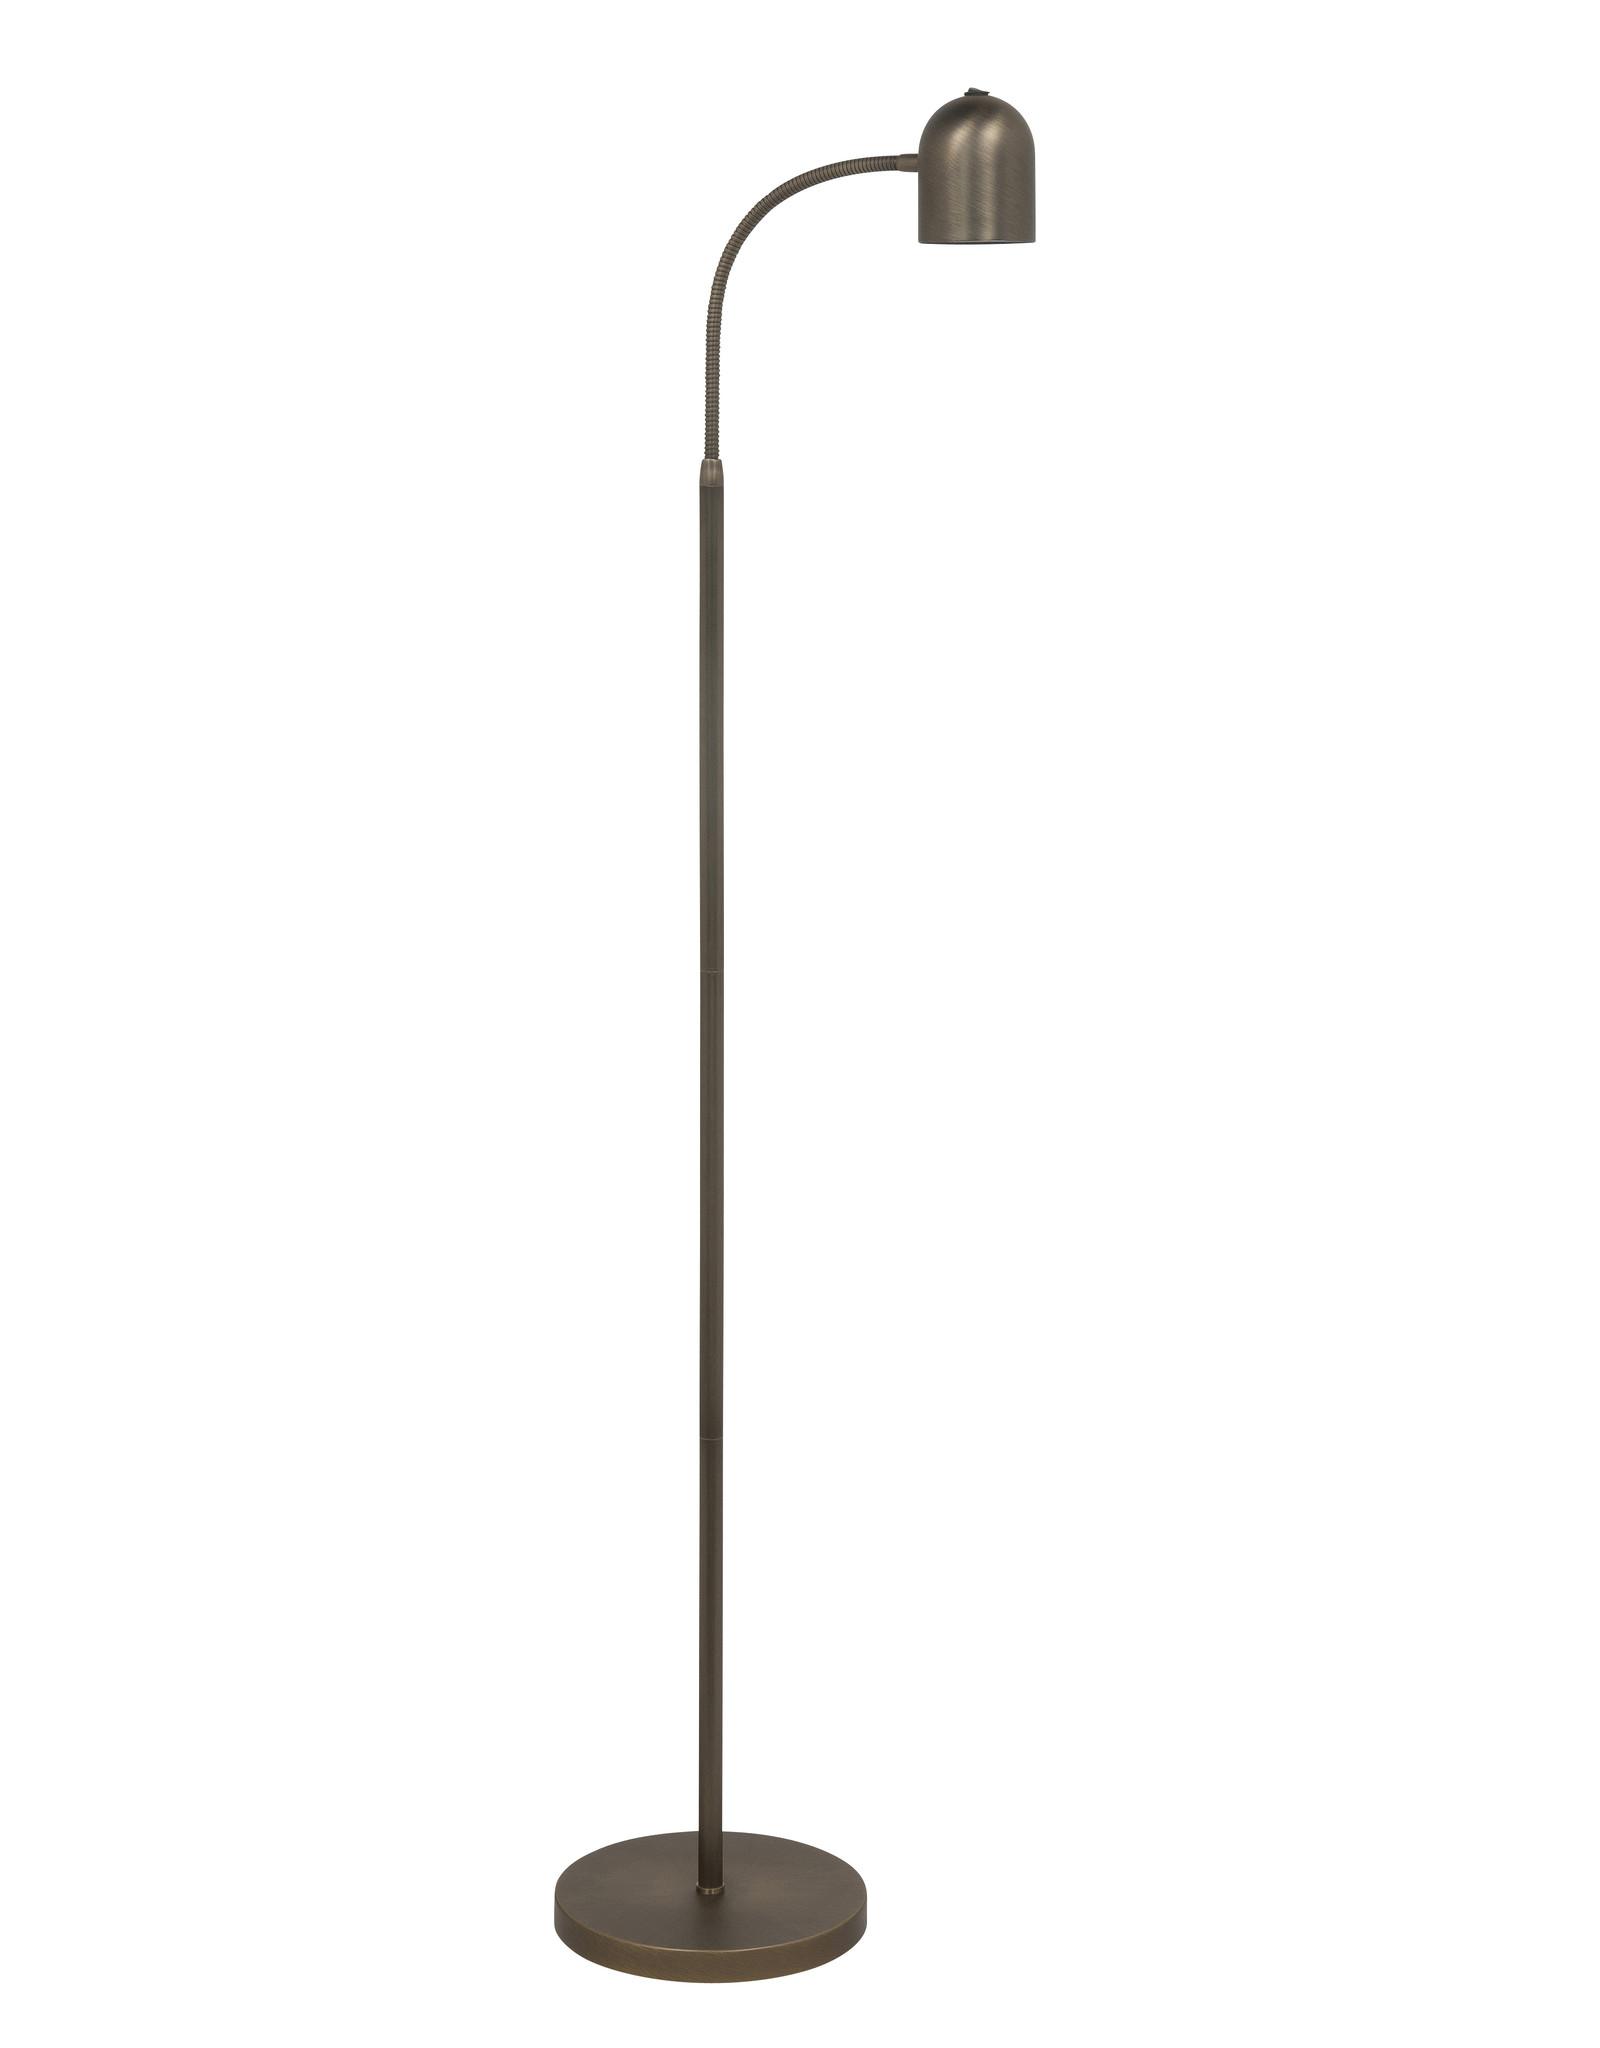 Vloerlamp Umbria 5W 2700K LED Brons